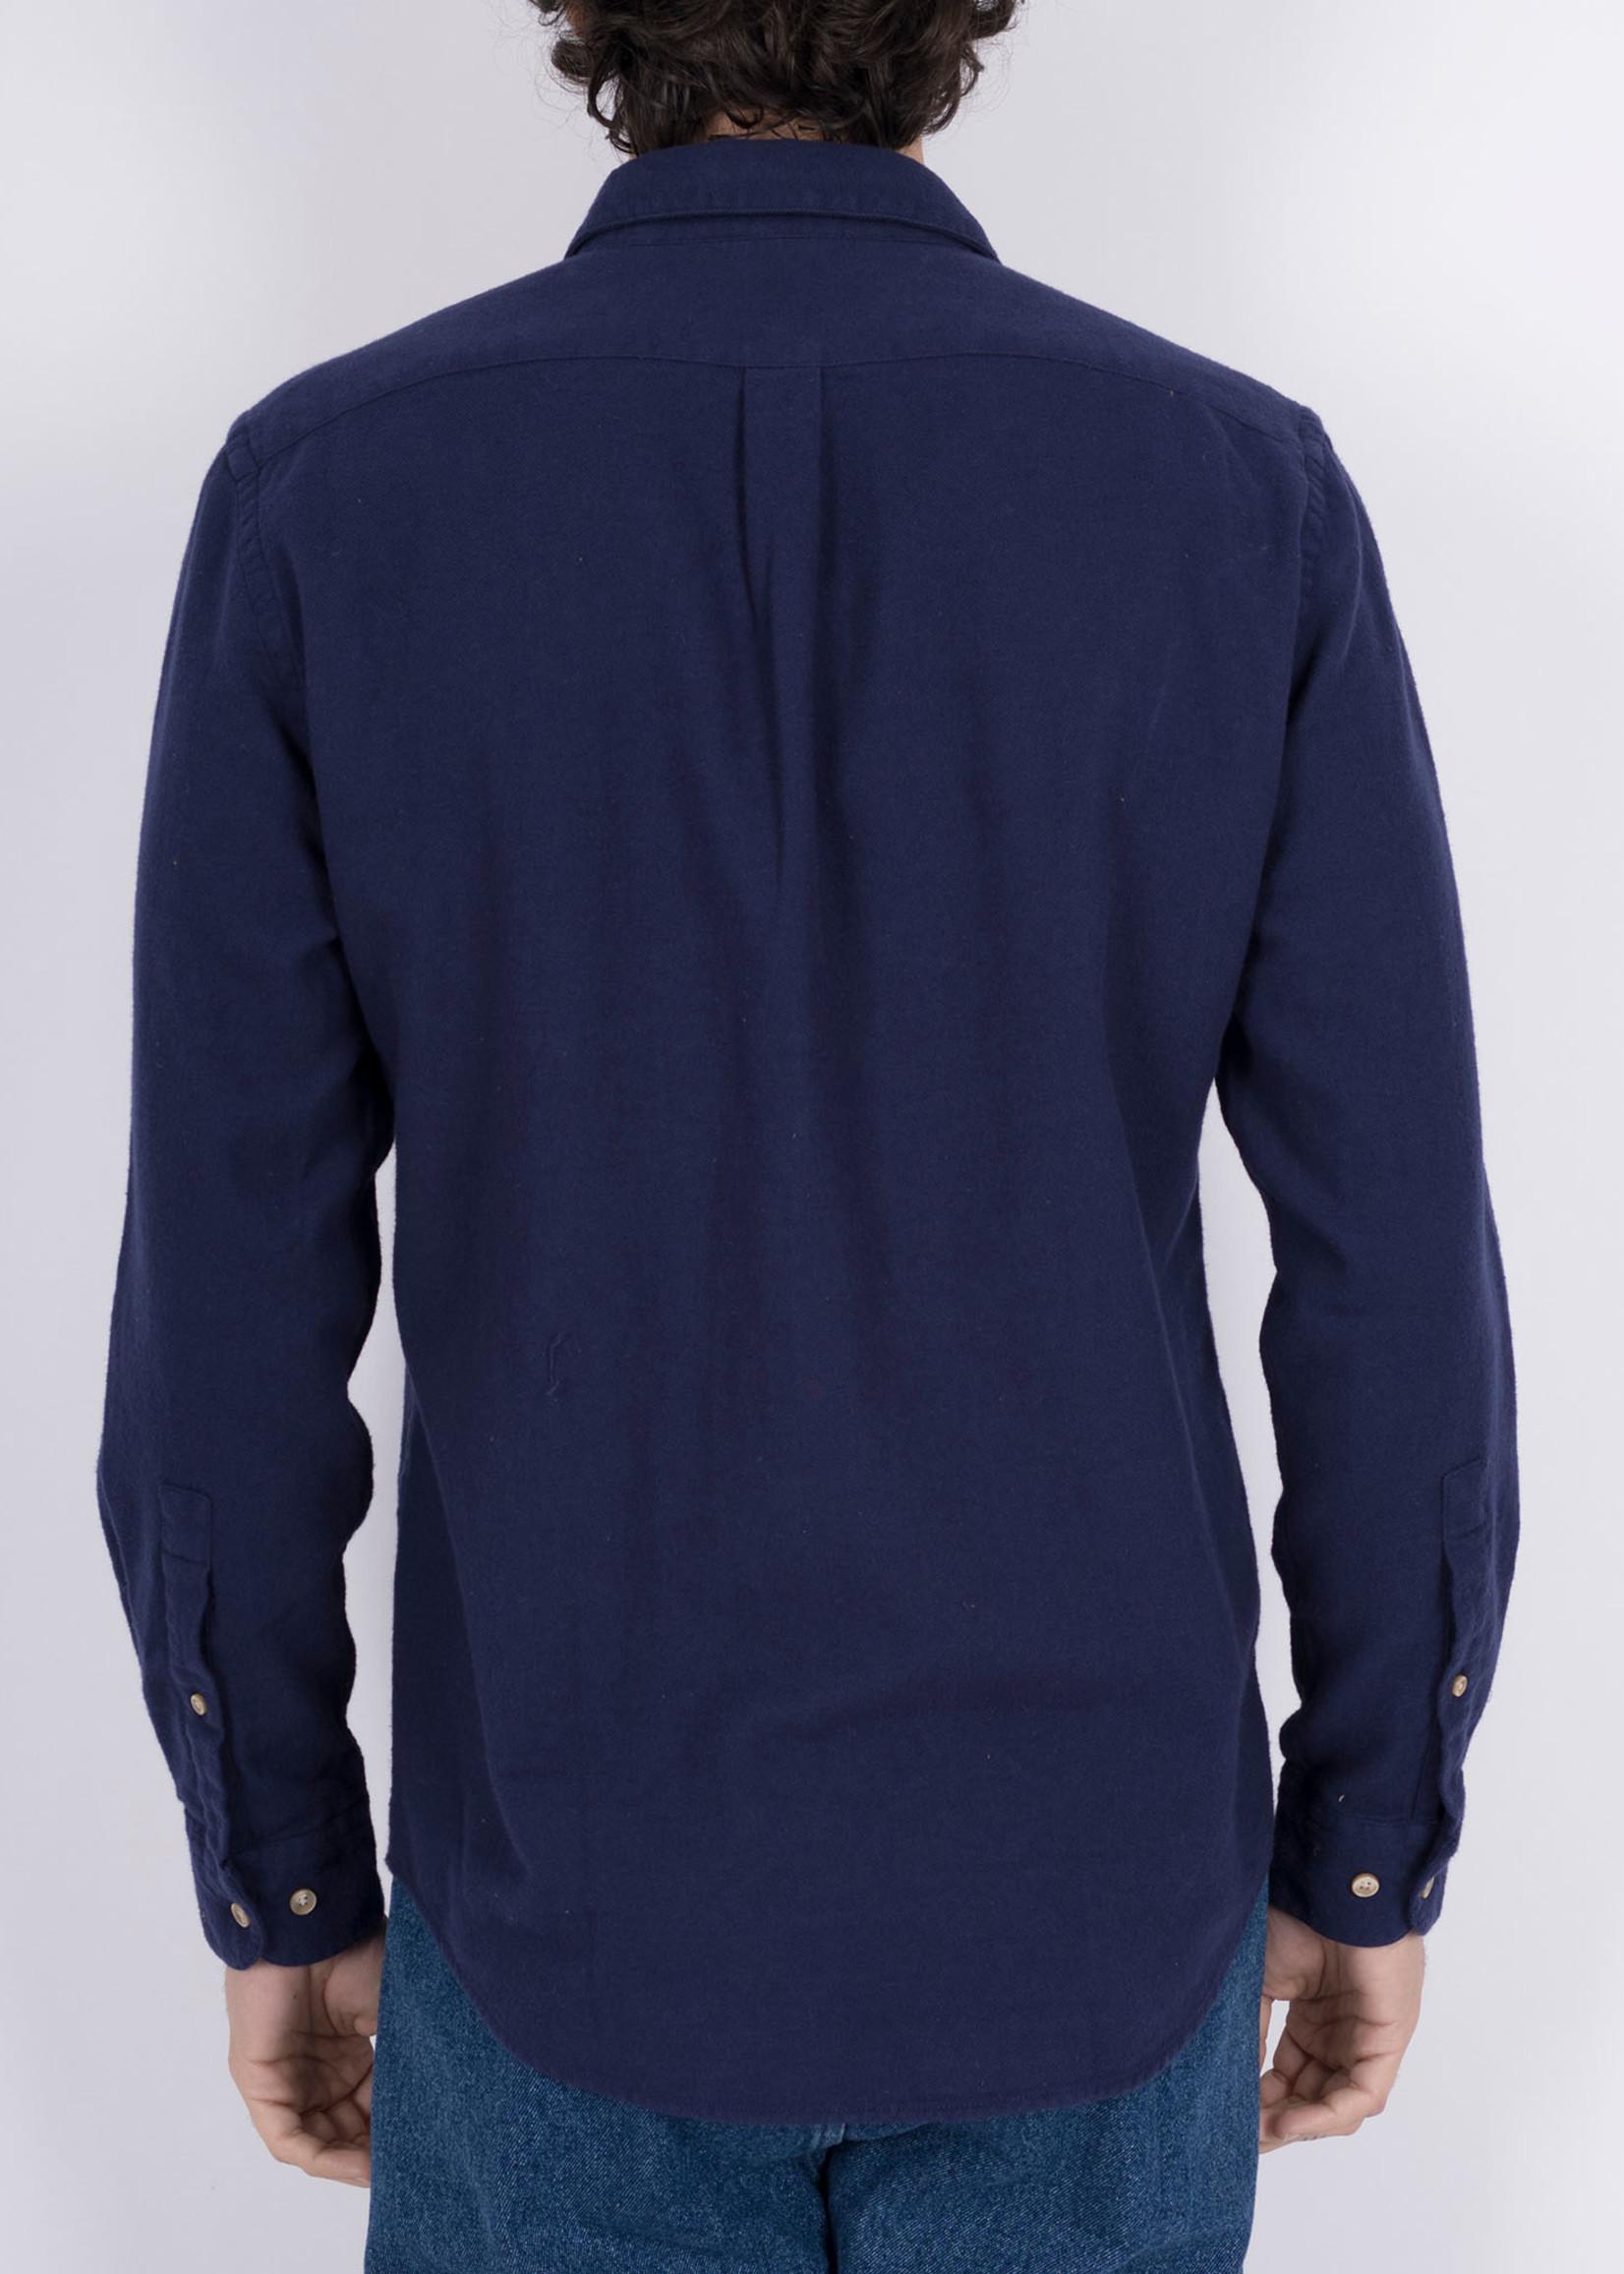 Portuguese Flannel Teca Navy Cotton Flannel Sport Shirt by Portuguese Flannel